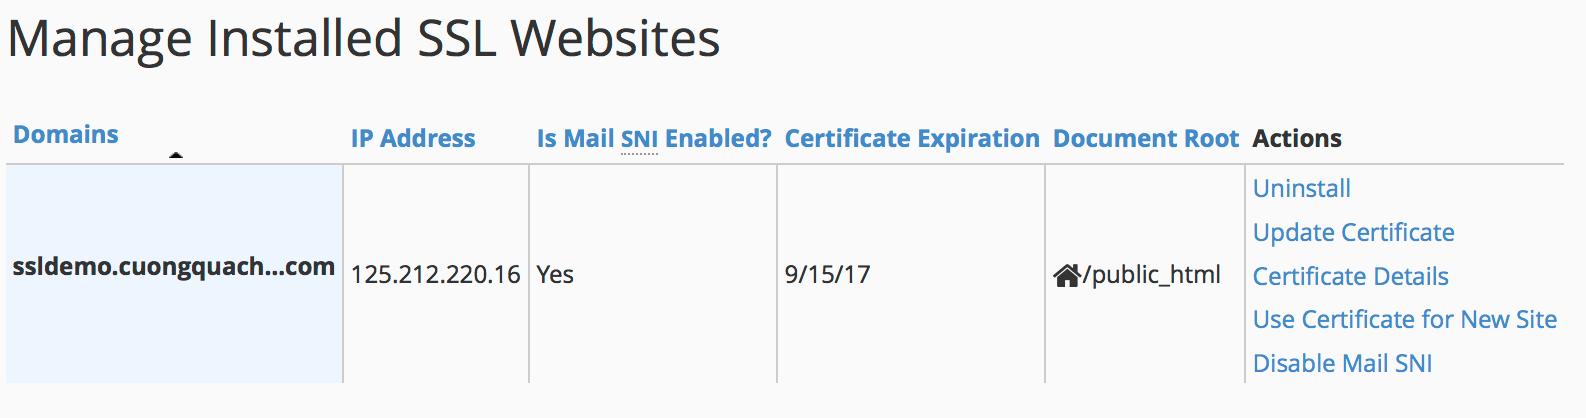 ssl-managed-installed-cpanel